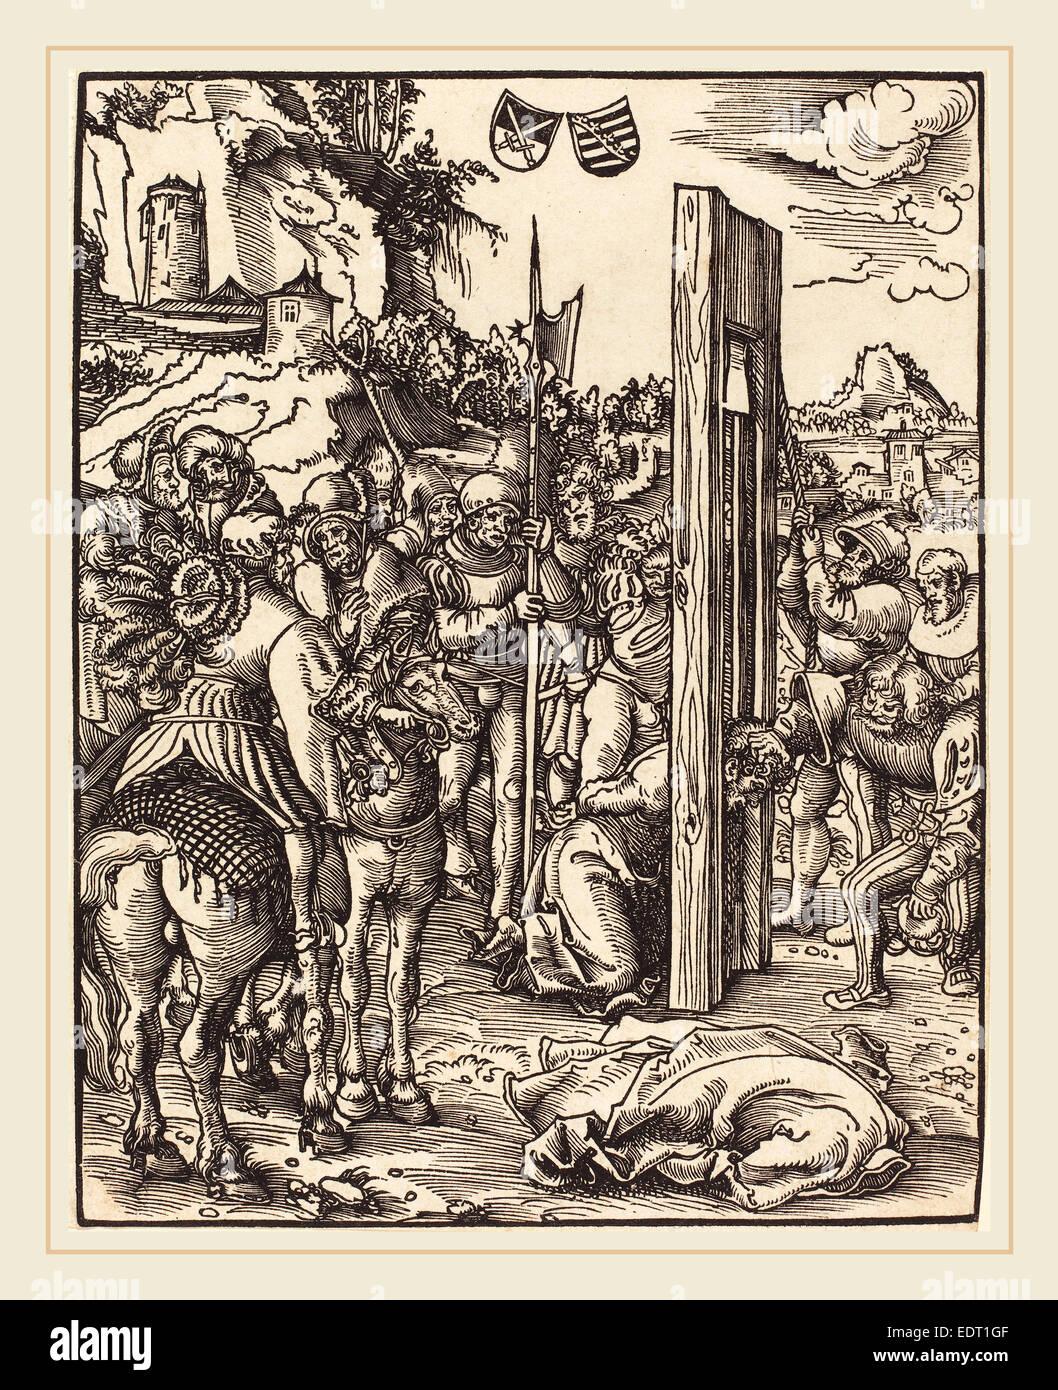 Lucas Cranach the Elder (German, 1472-1553), Saint Matthias, woodcut